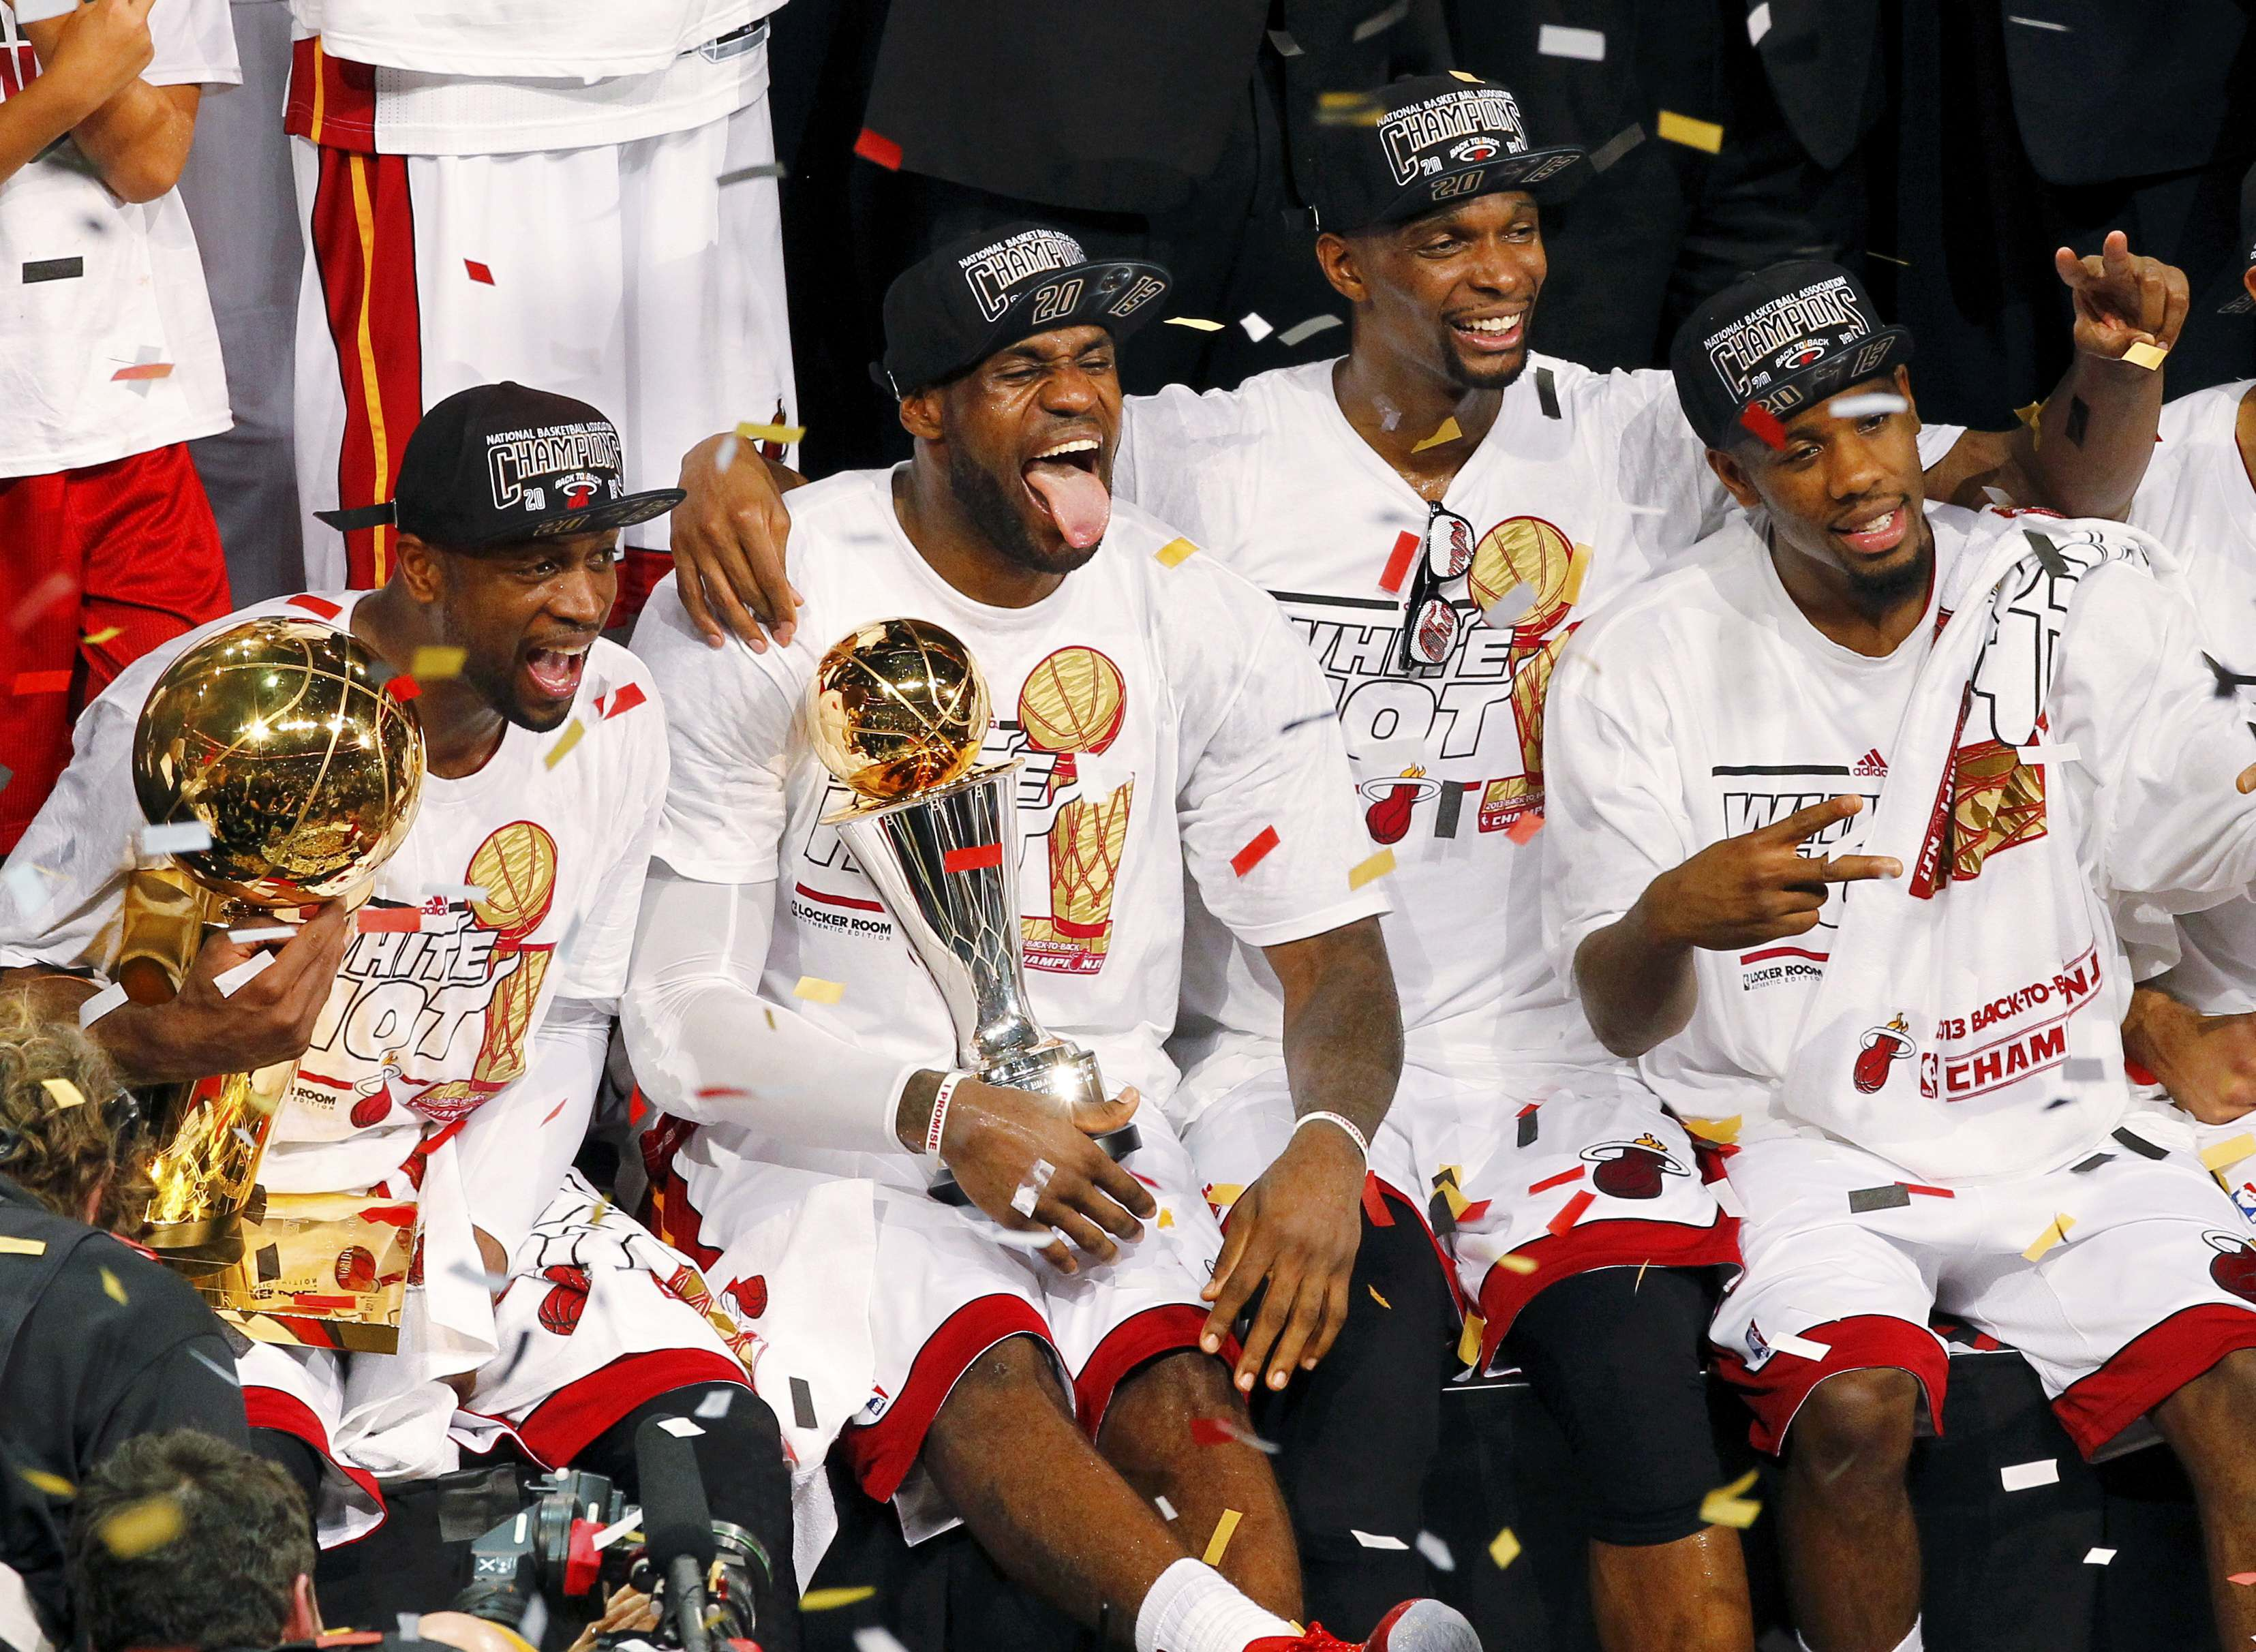 Miami Heat retain NBA championship   News   Al Jazeera